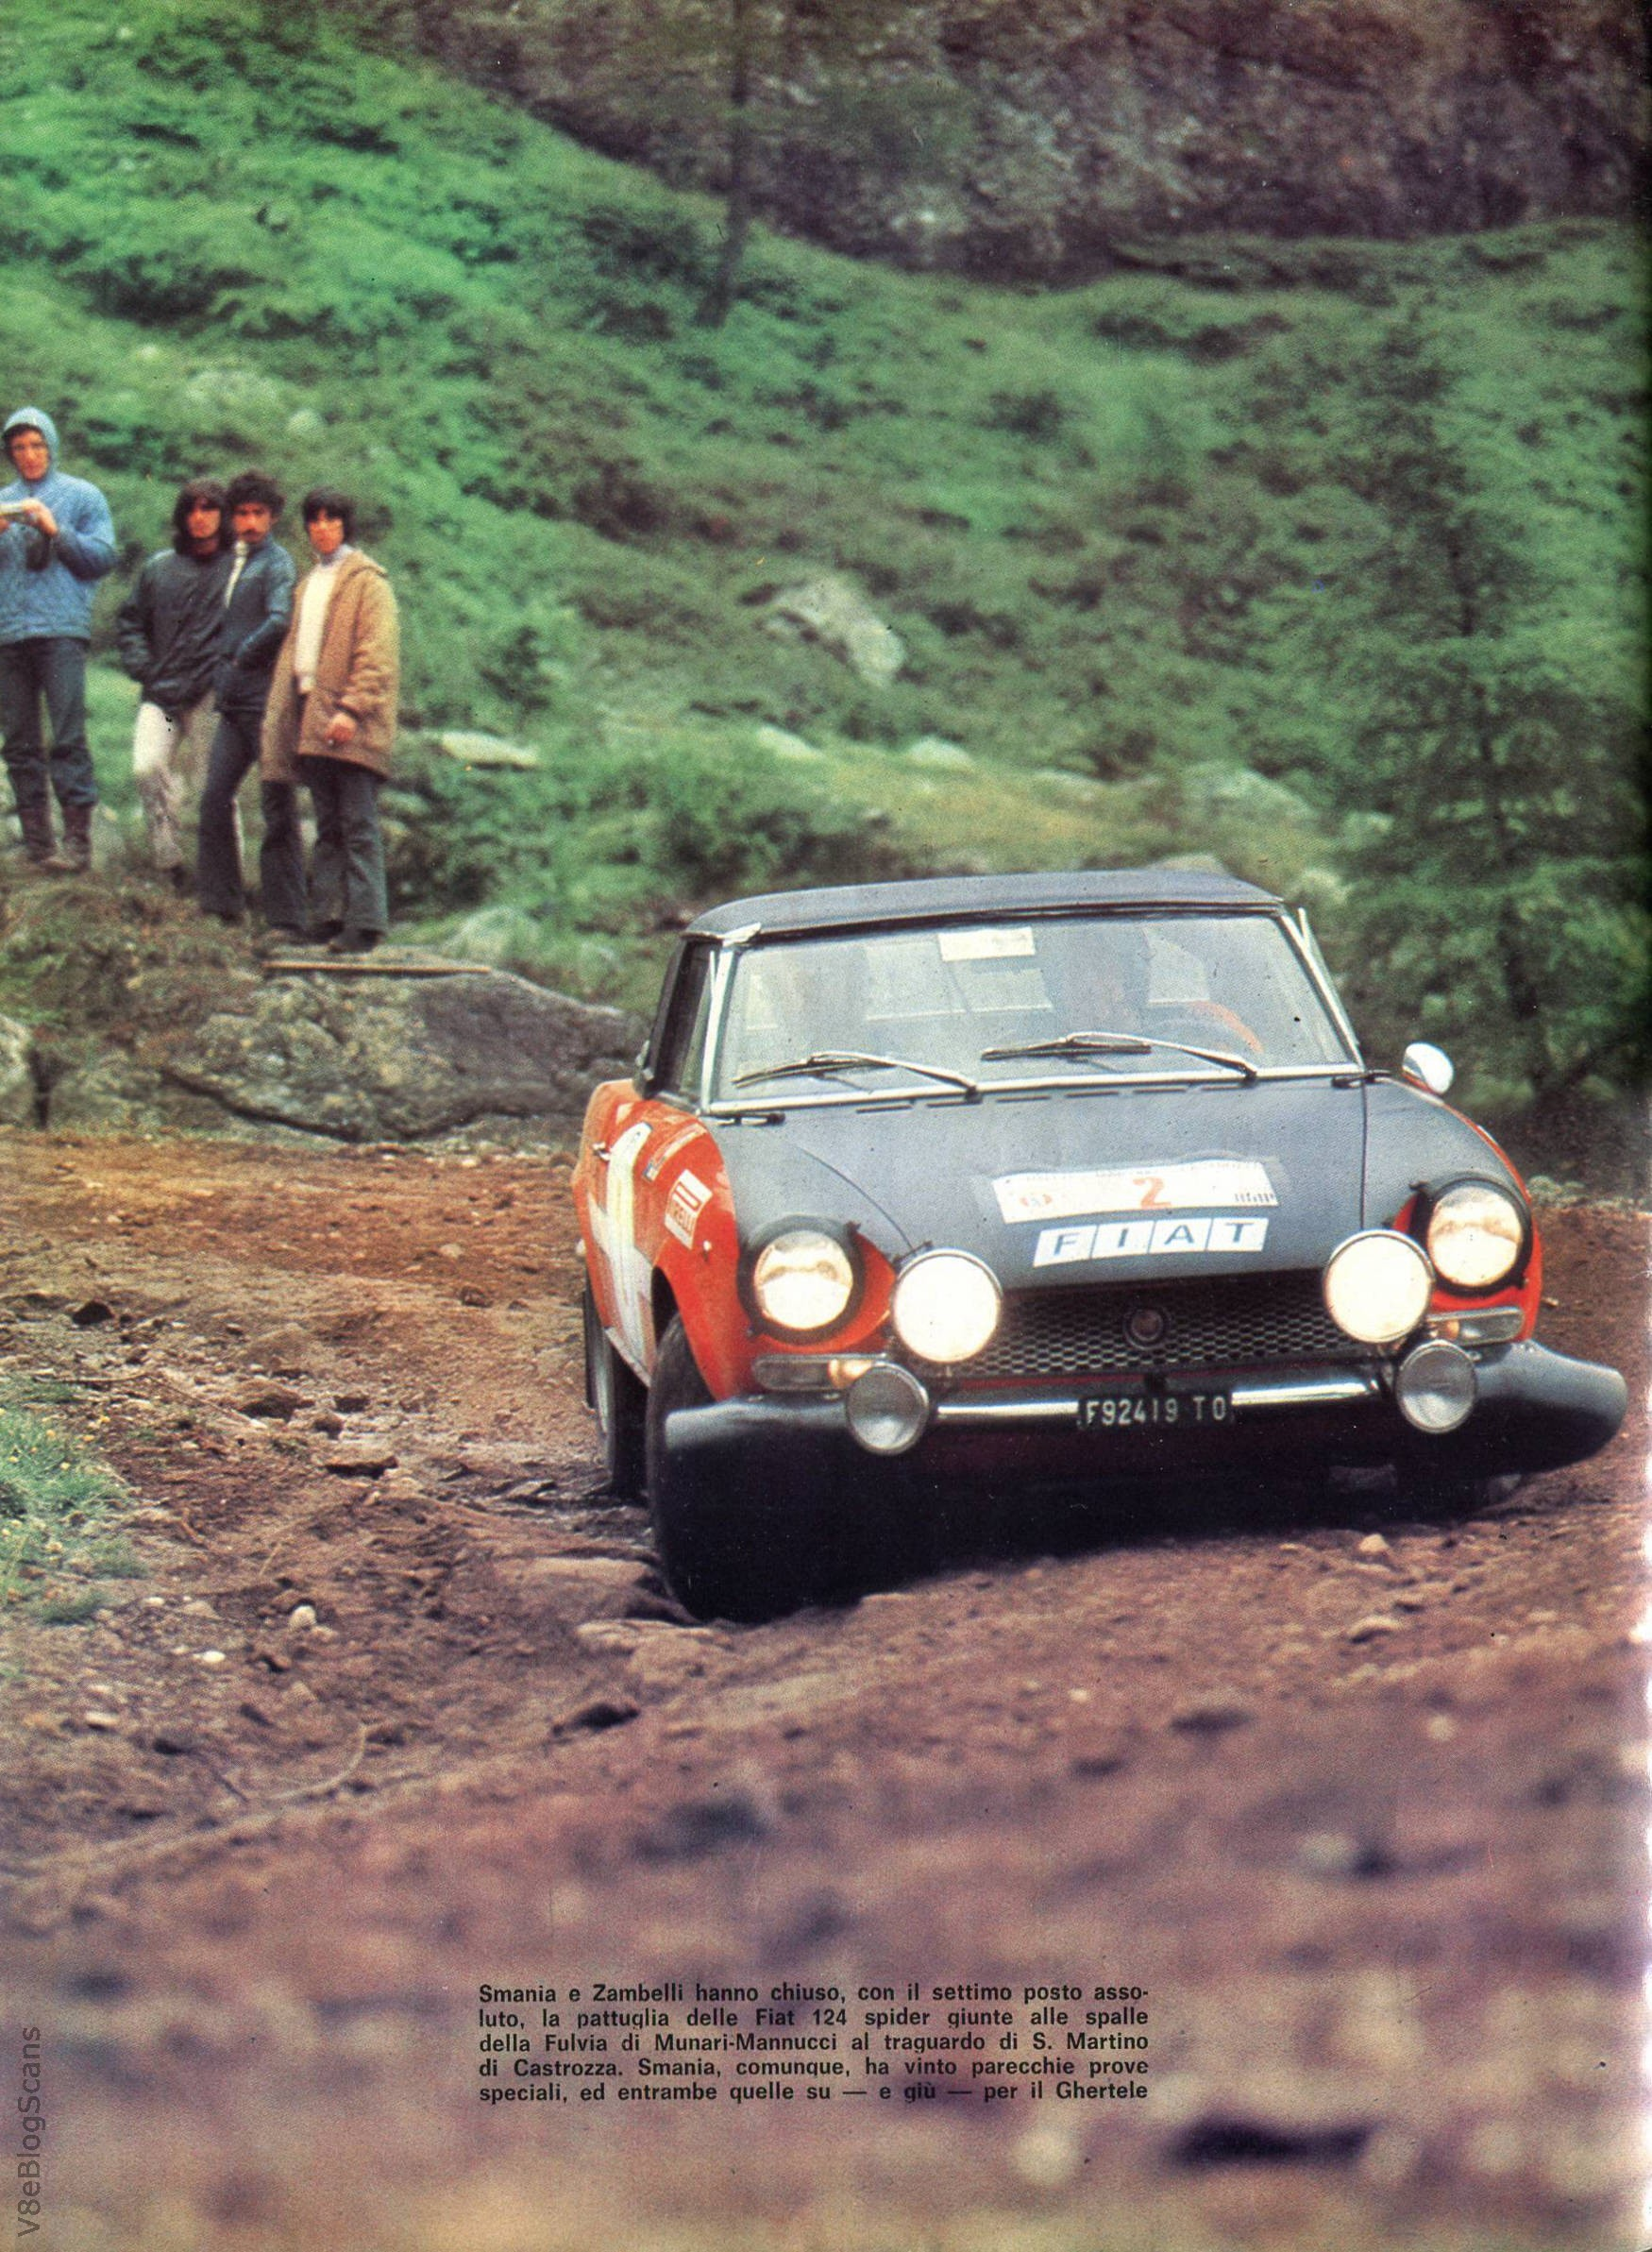 As on 1973 Alfa Romeo Spider